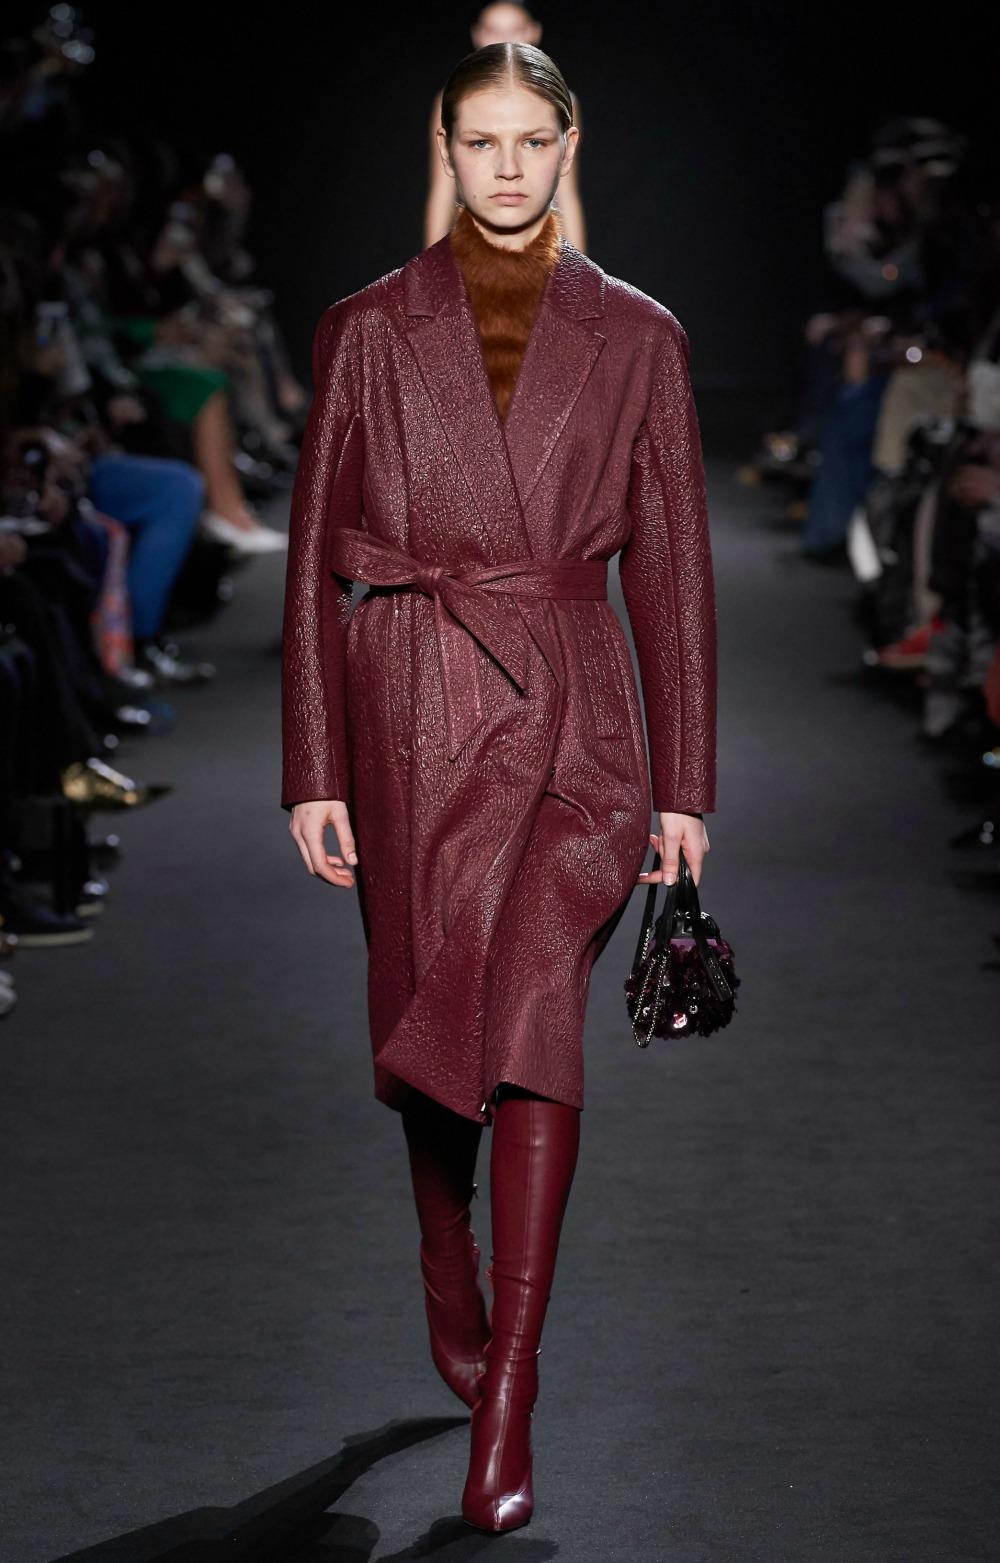 Best Paris Fashion Week Looks -Rochas Fall 2019 Runway Collection #PFW #FashionWeek